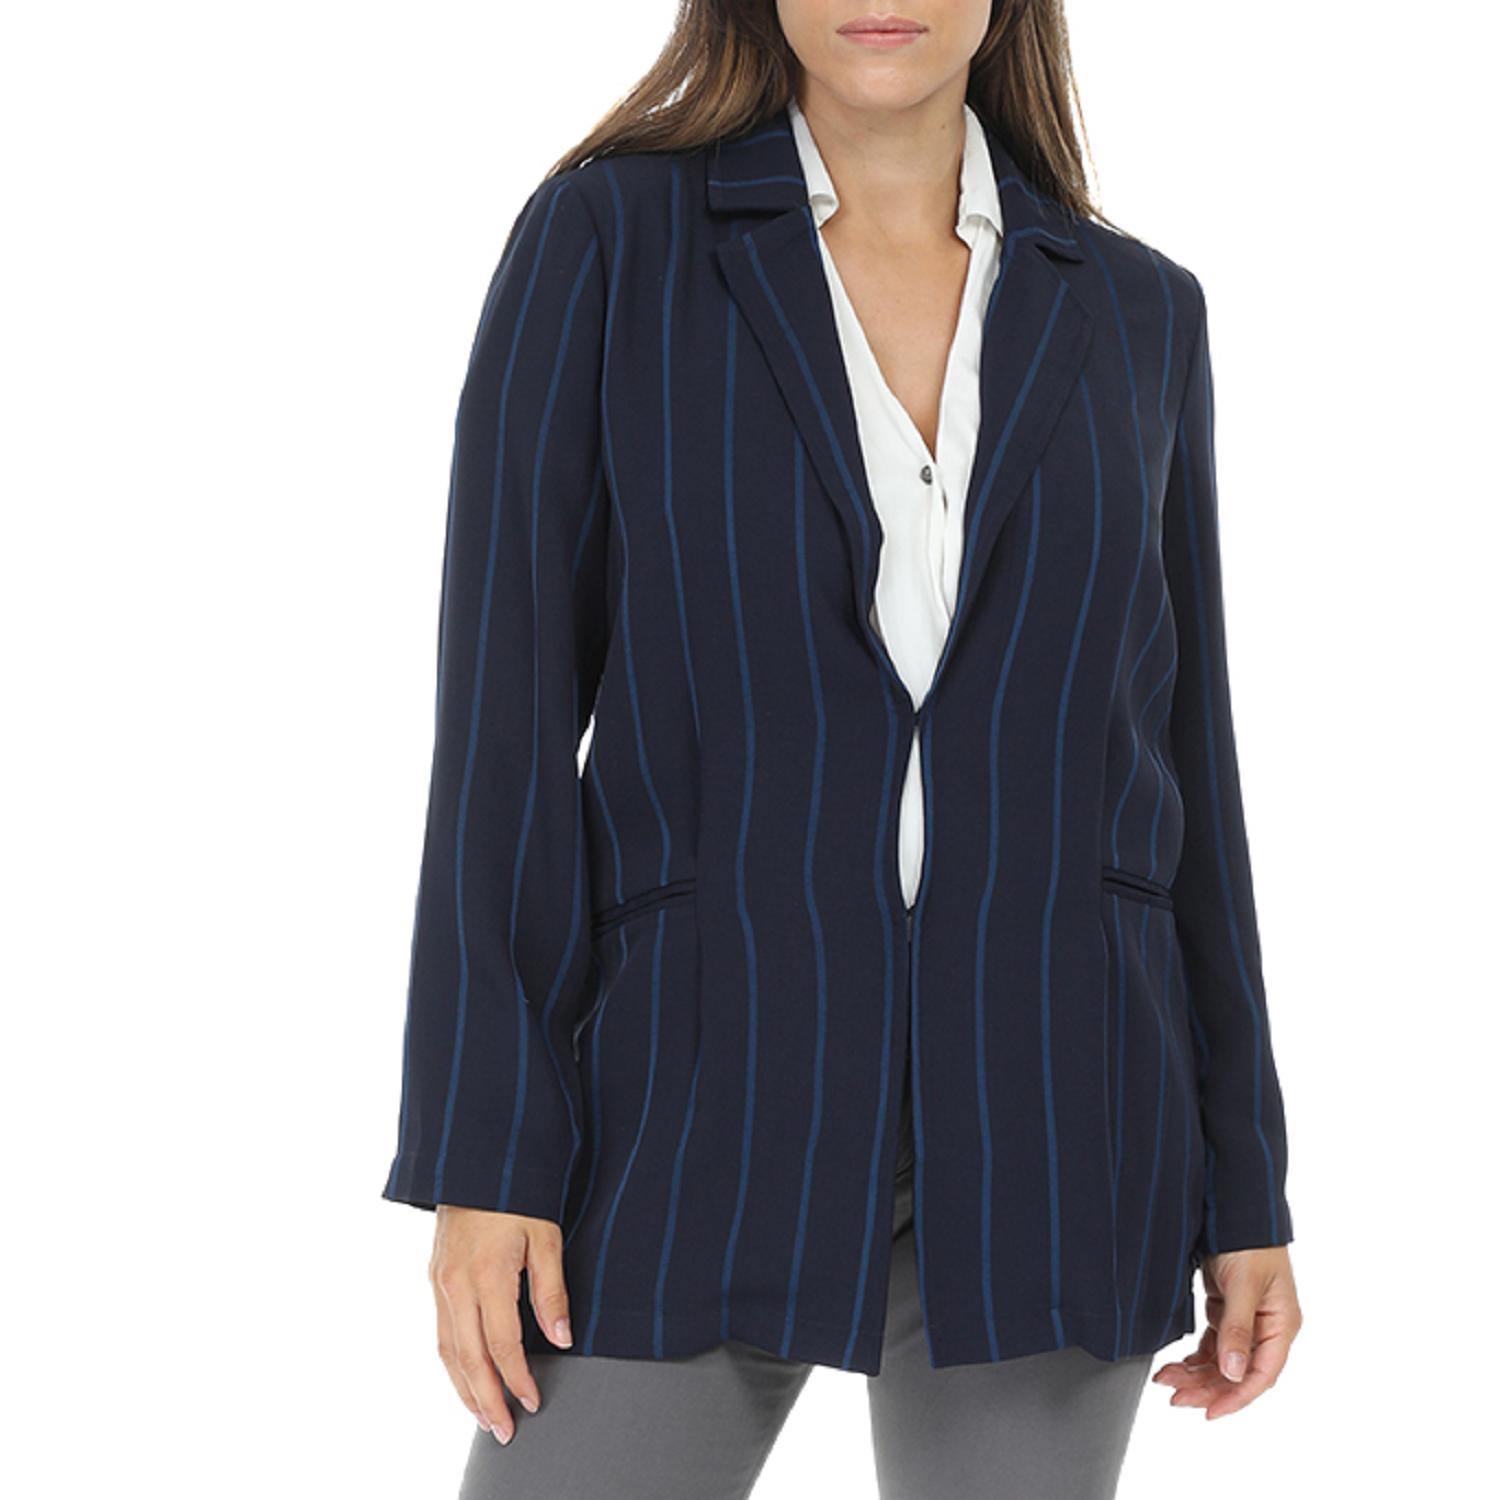 NU - Γυναικείο σακάκι NU μπλε